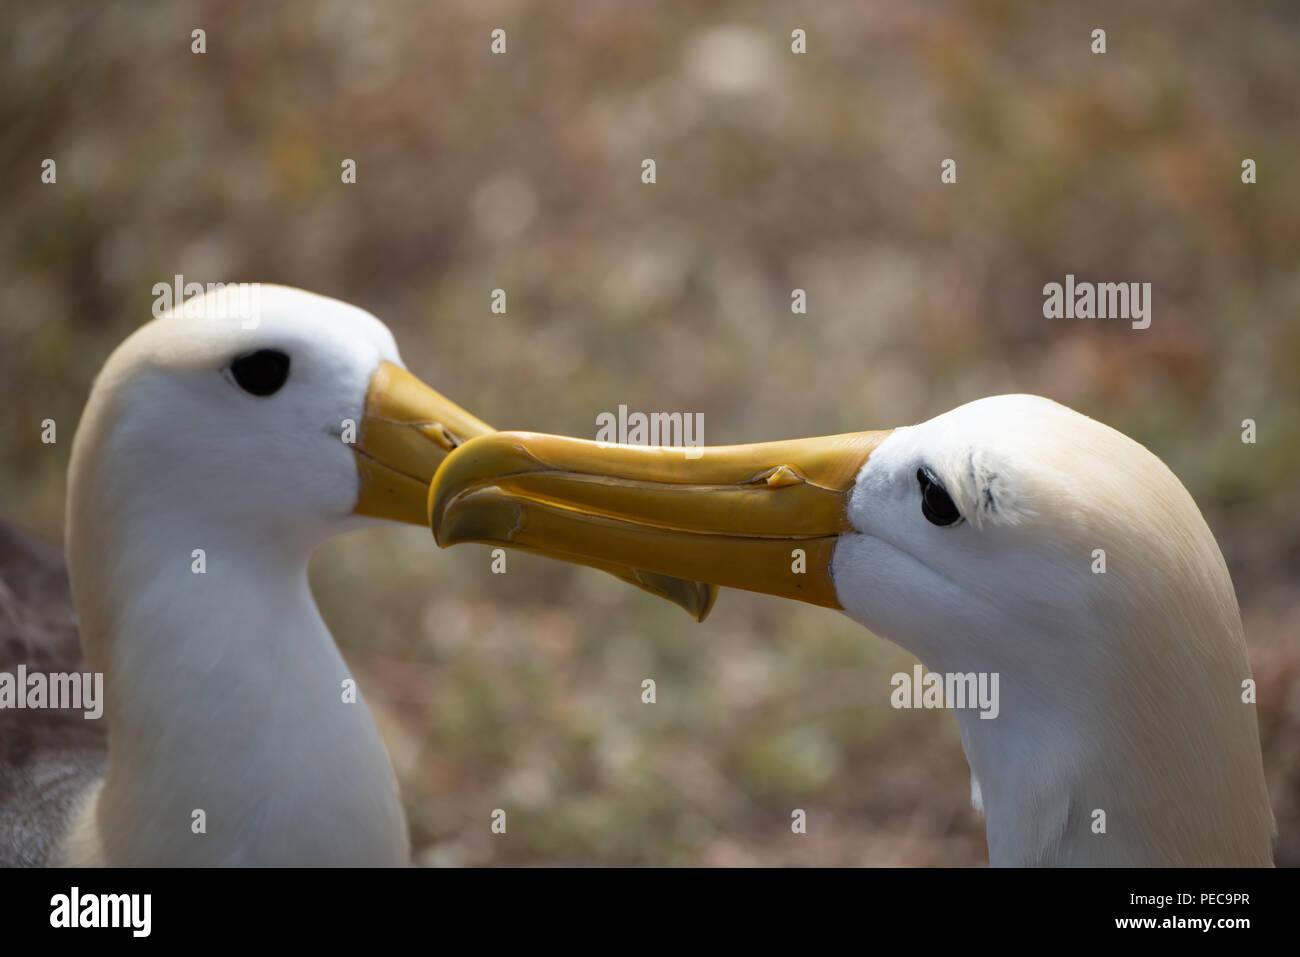 Winkte Albatross Umwerbung Stockbild